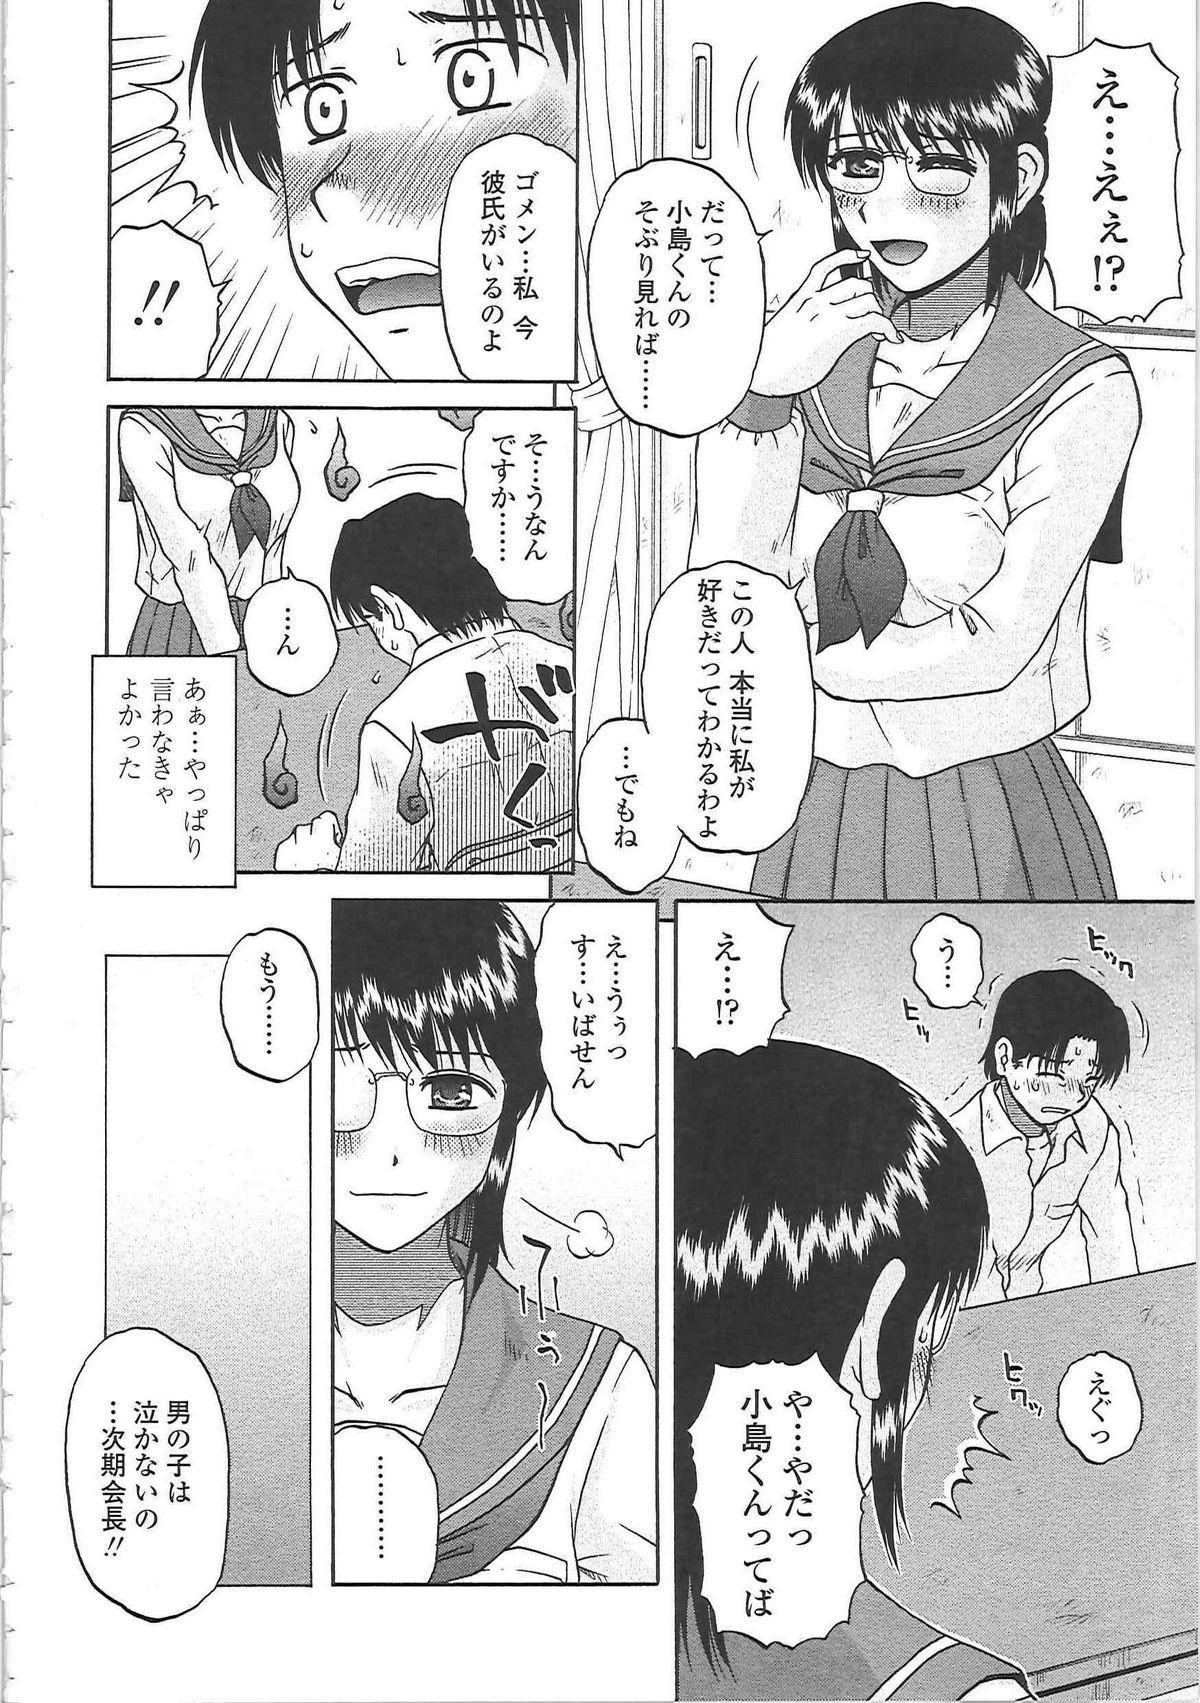 Nikuzuma Tsuushin - Erotic Wife Communication 82